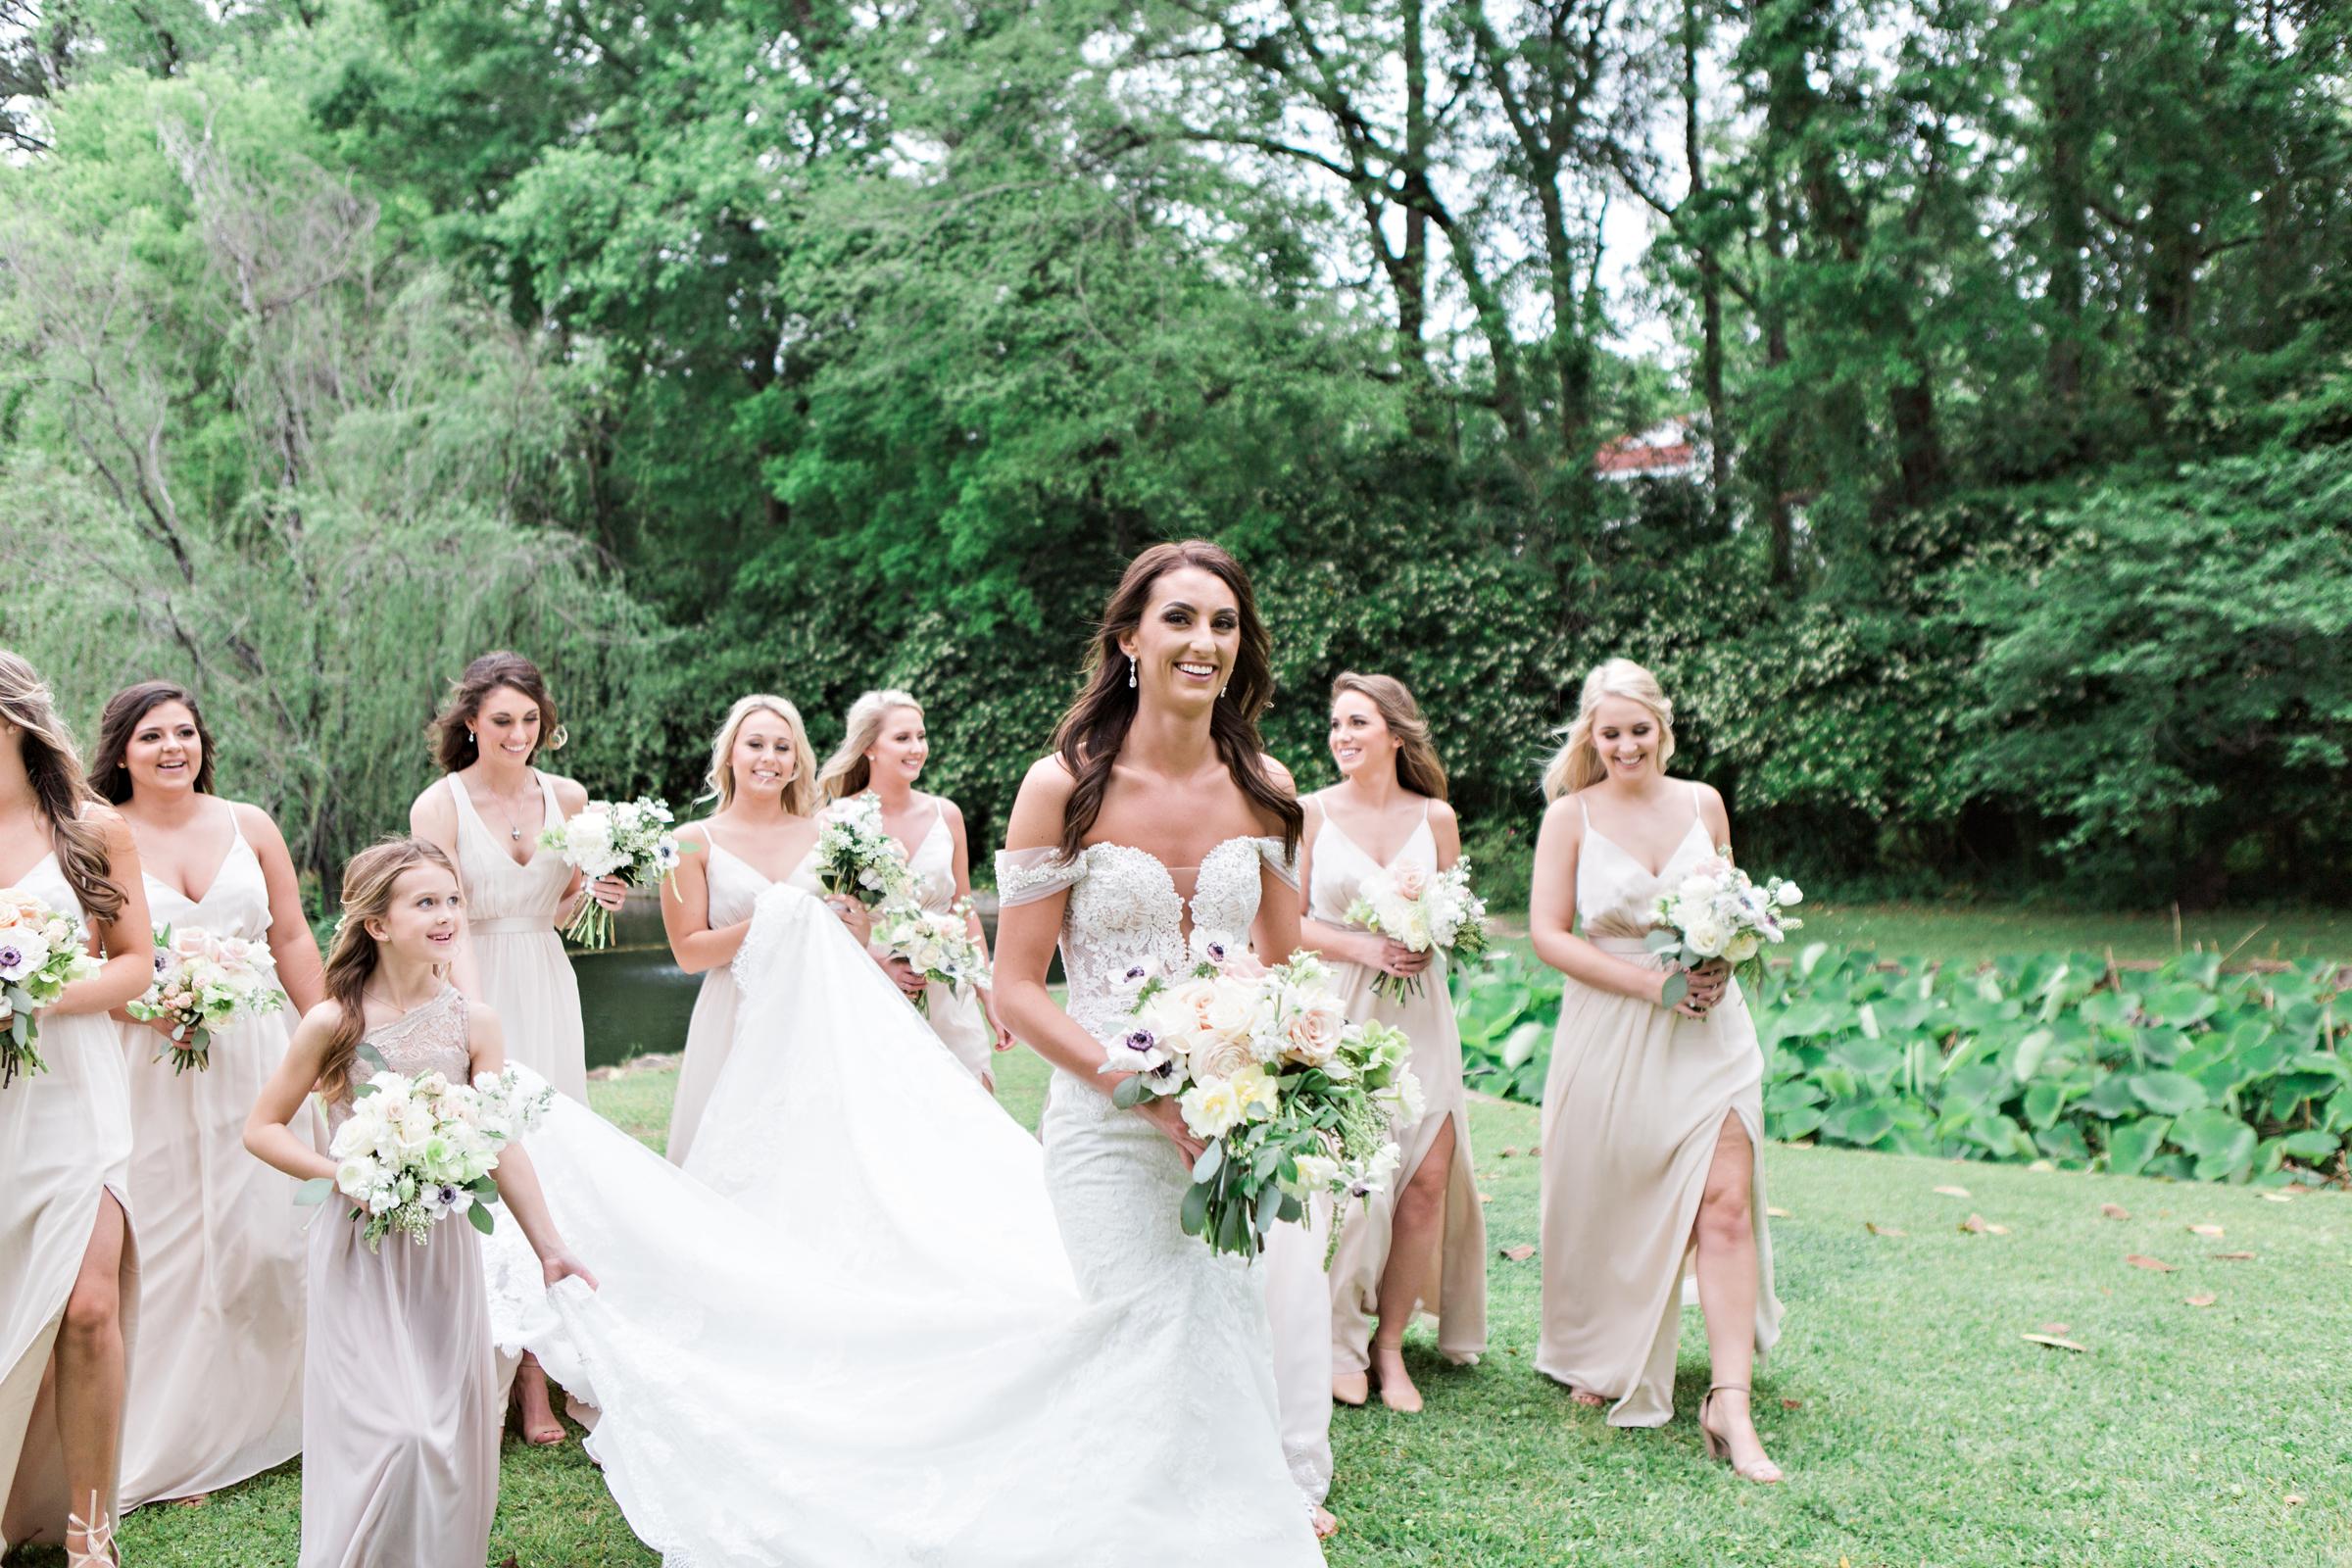 Matty-Drollette-Montgomery-Alabama-Wedding-Photography-133.jpg